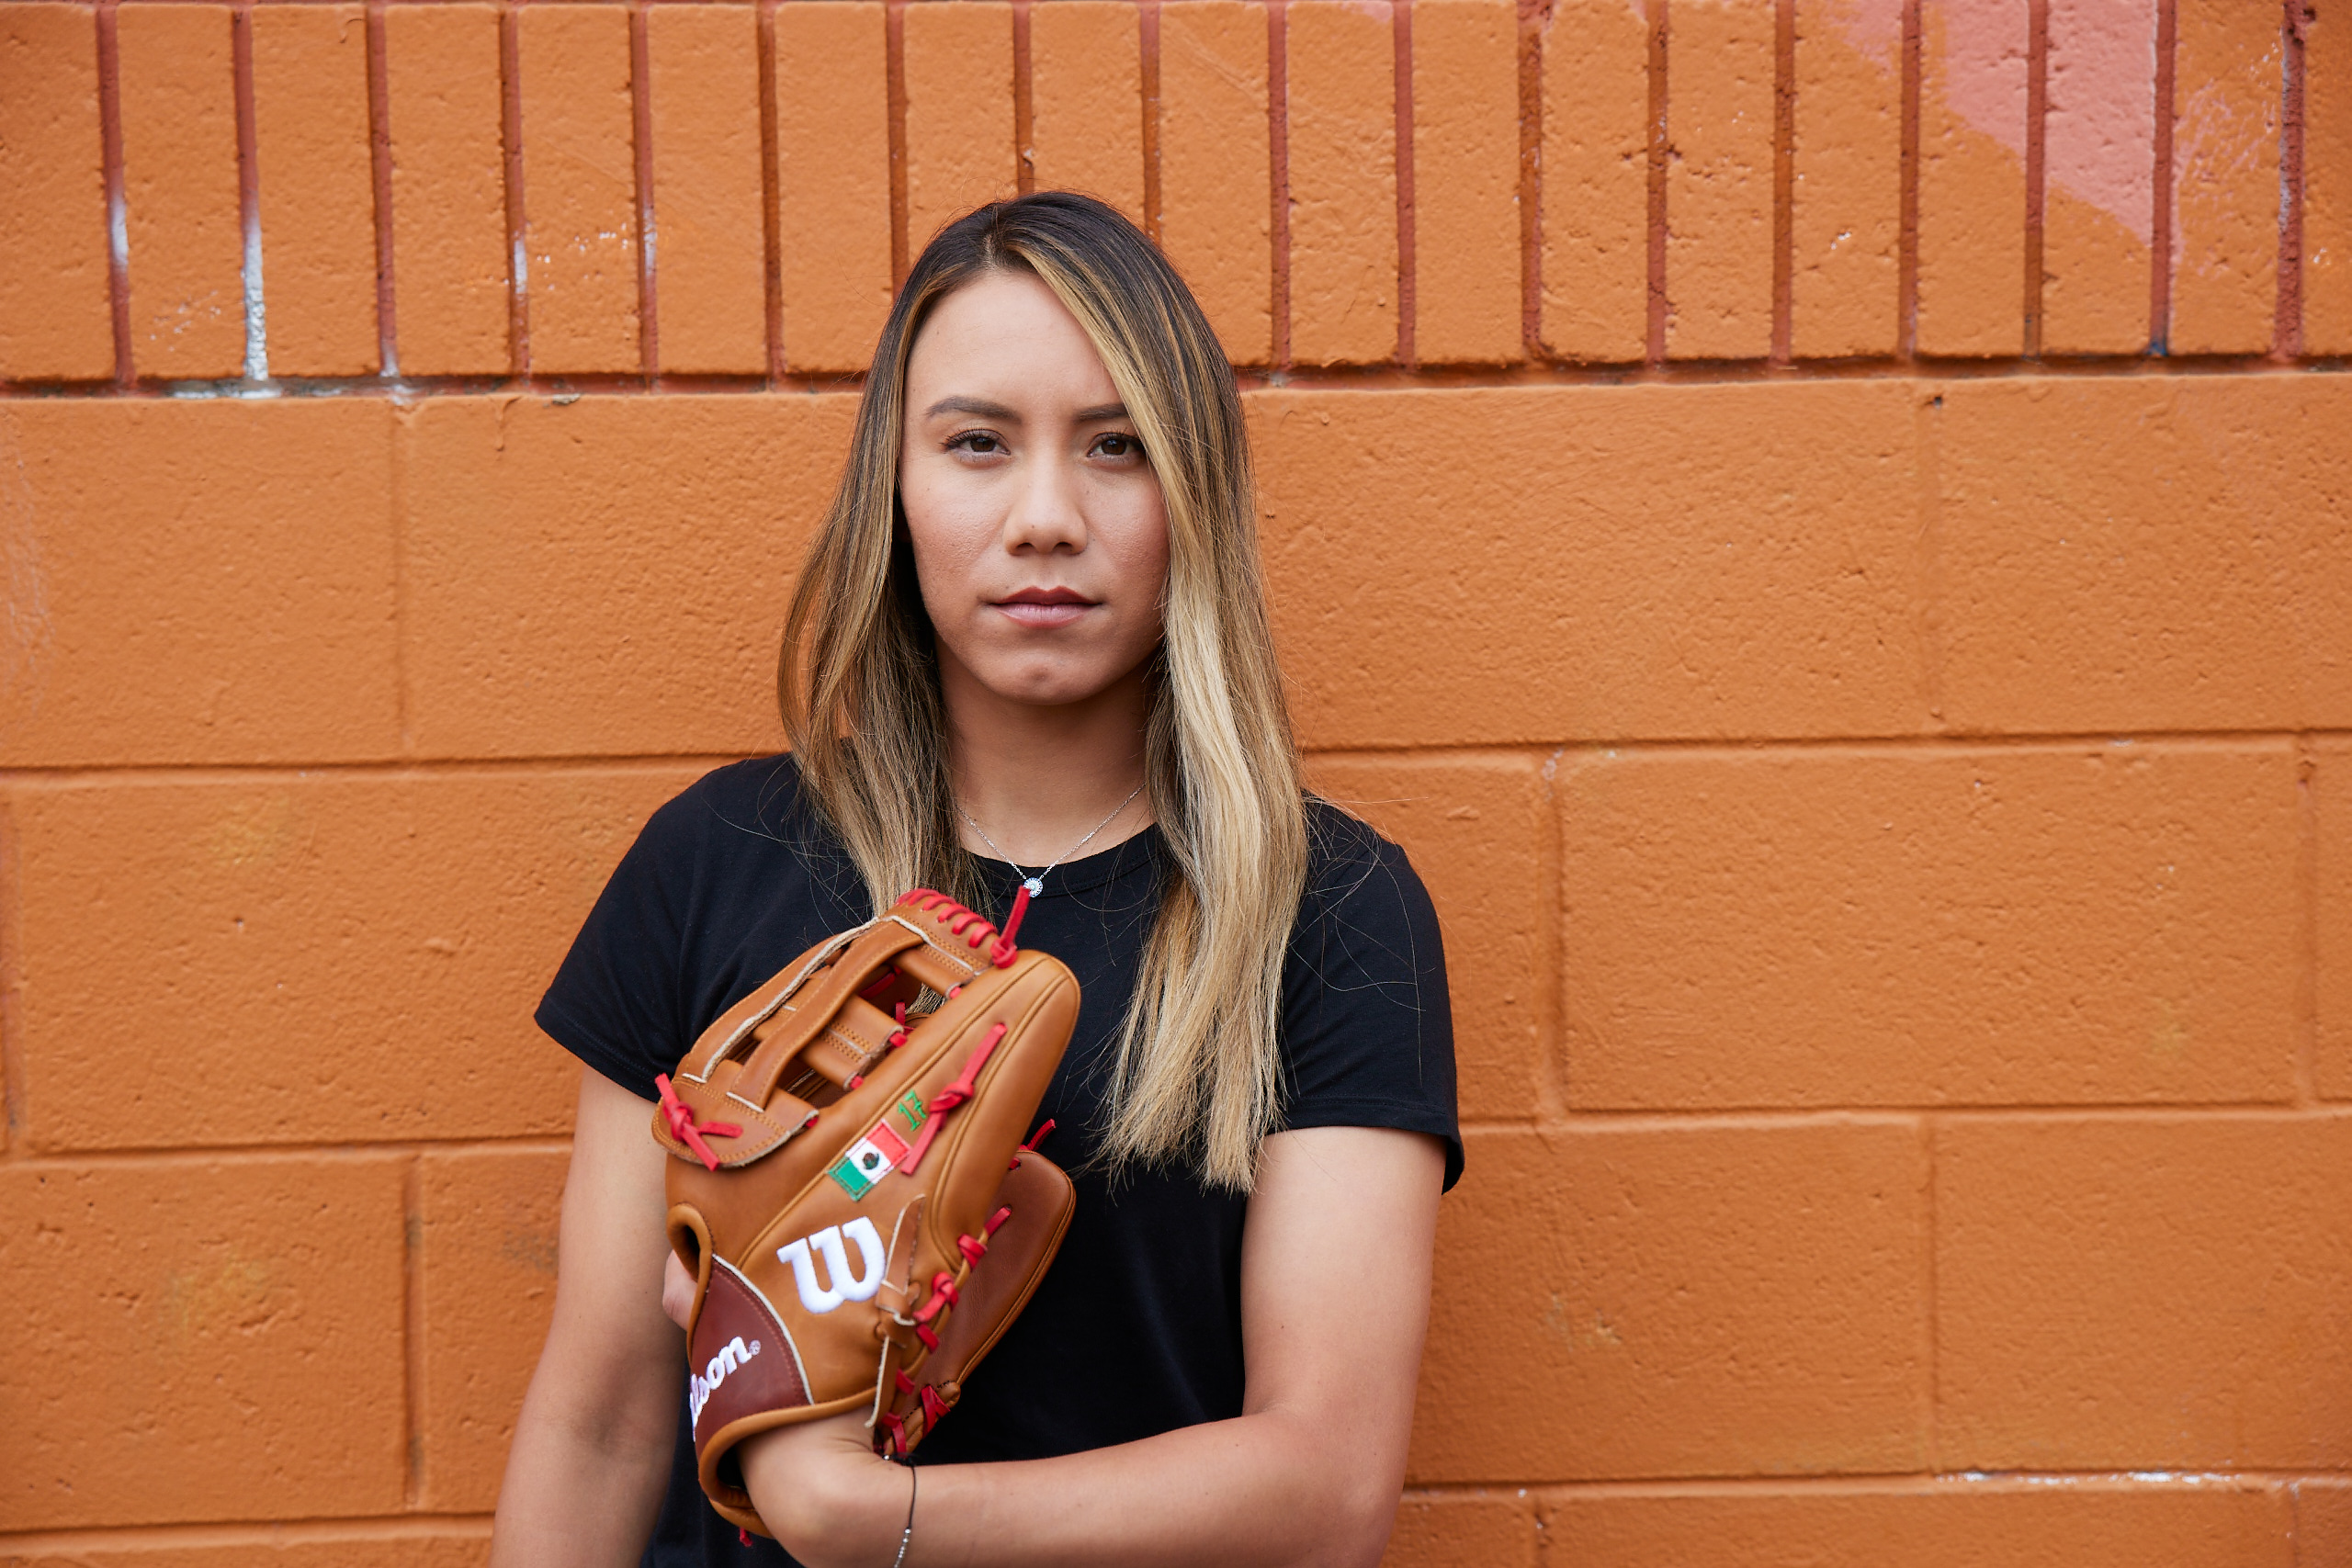 Anissa-Urtez-Wilson-Fastpitch-Softball-Athletes-Unlimited-A2000-Glove